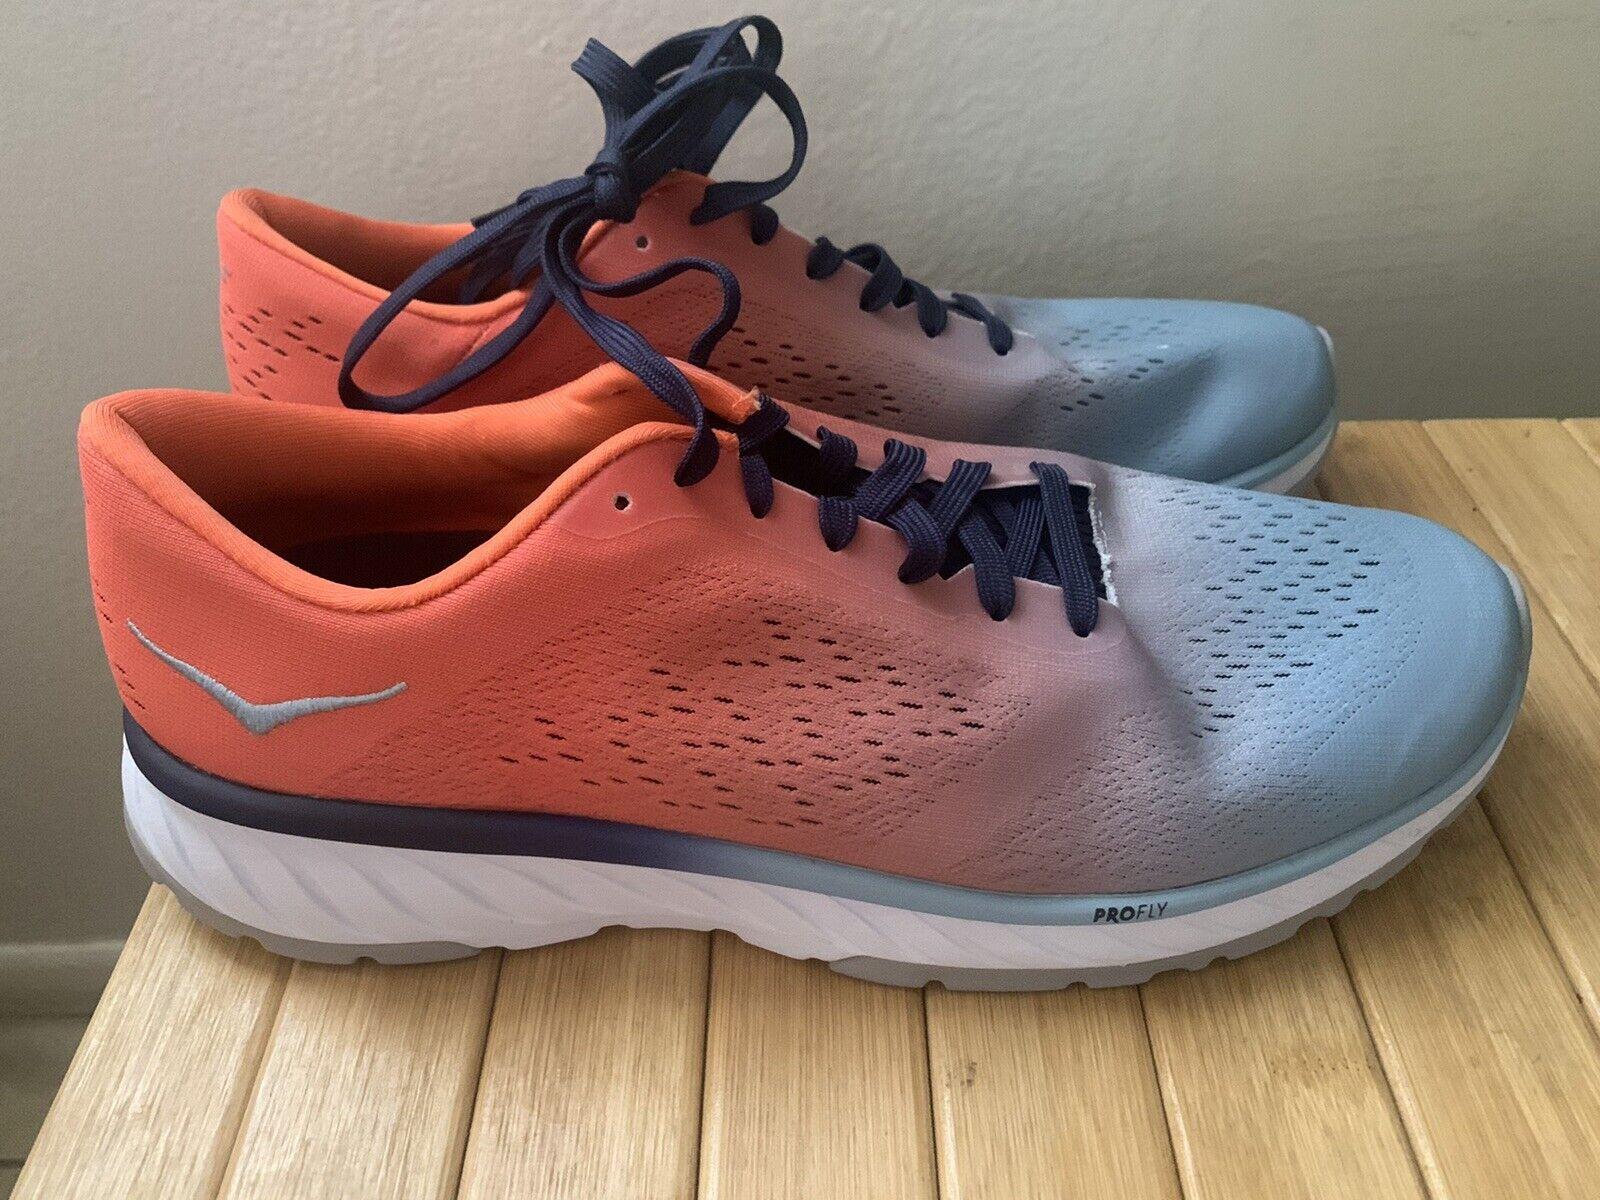 Men's Hoka One One Cavu 2 Running Shoes size 9.5 - image 8